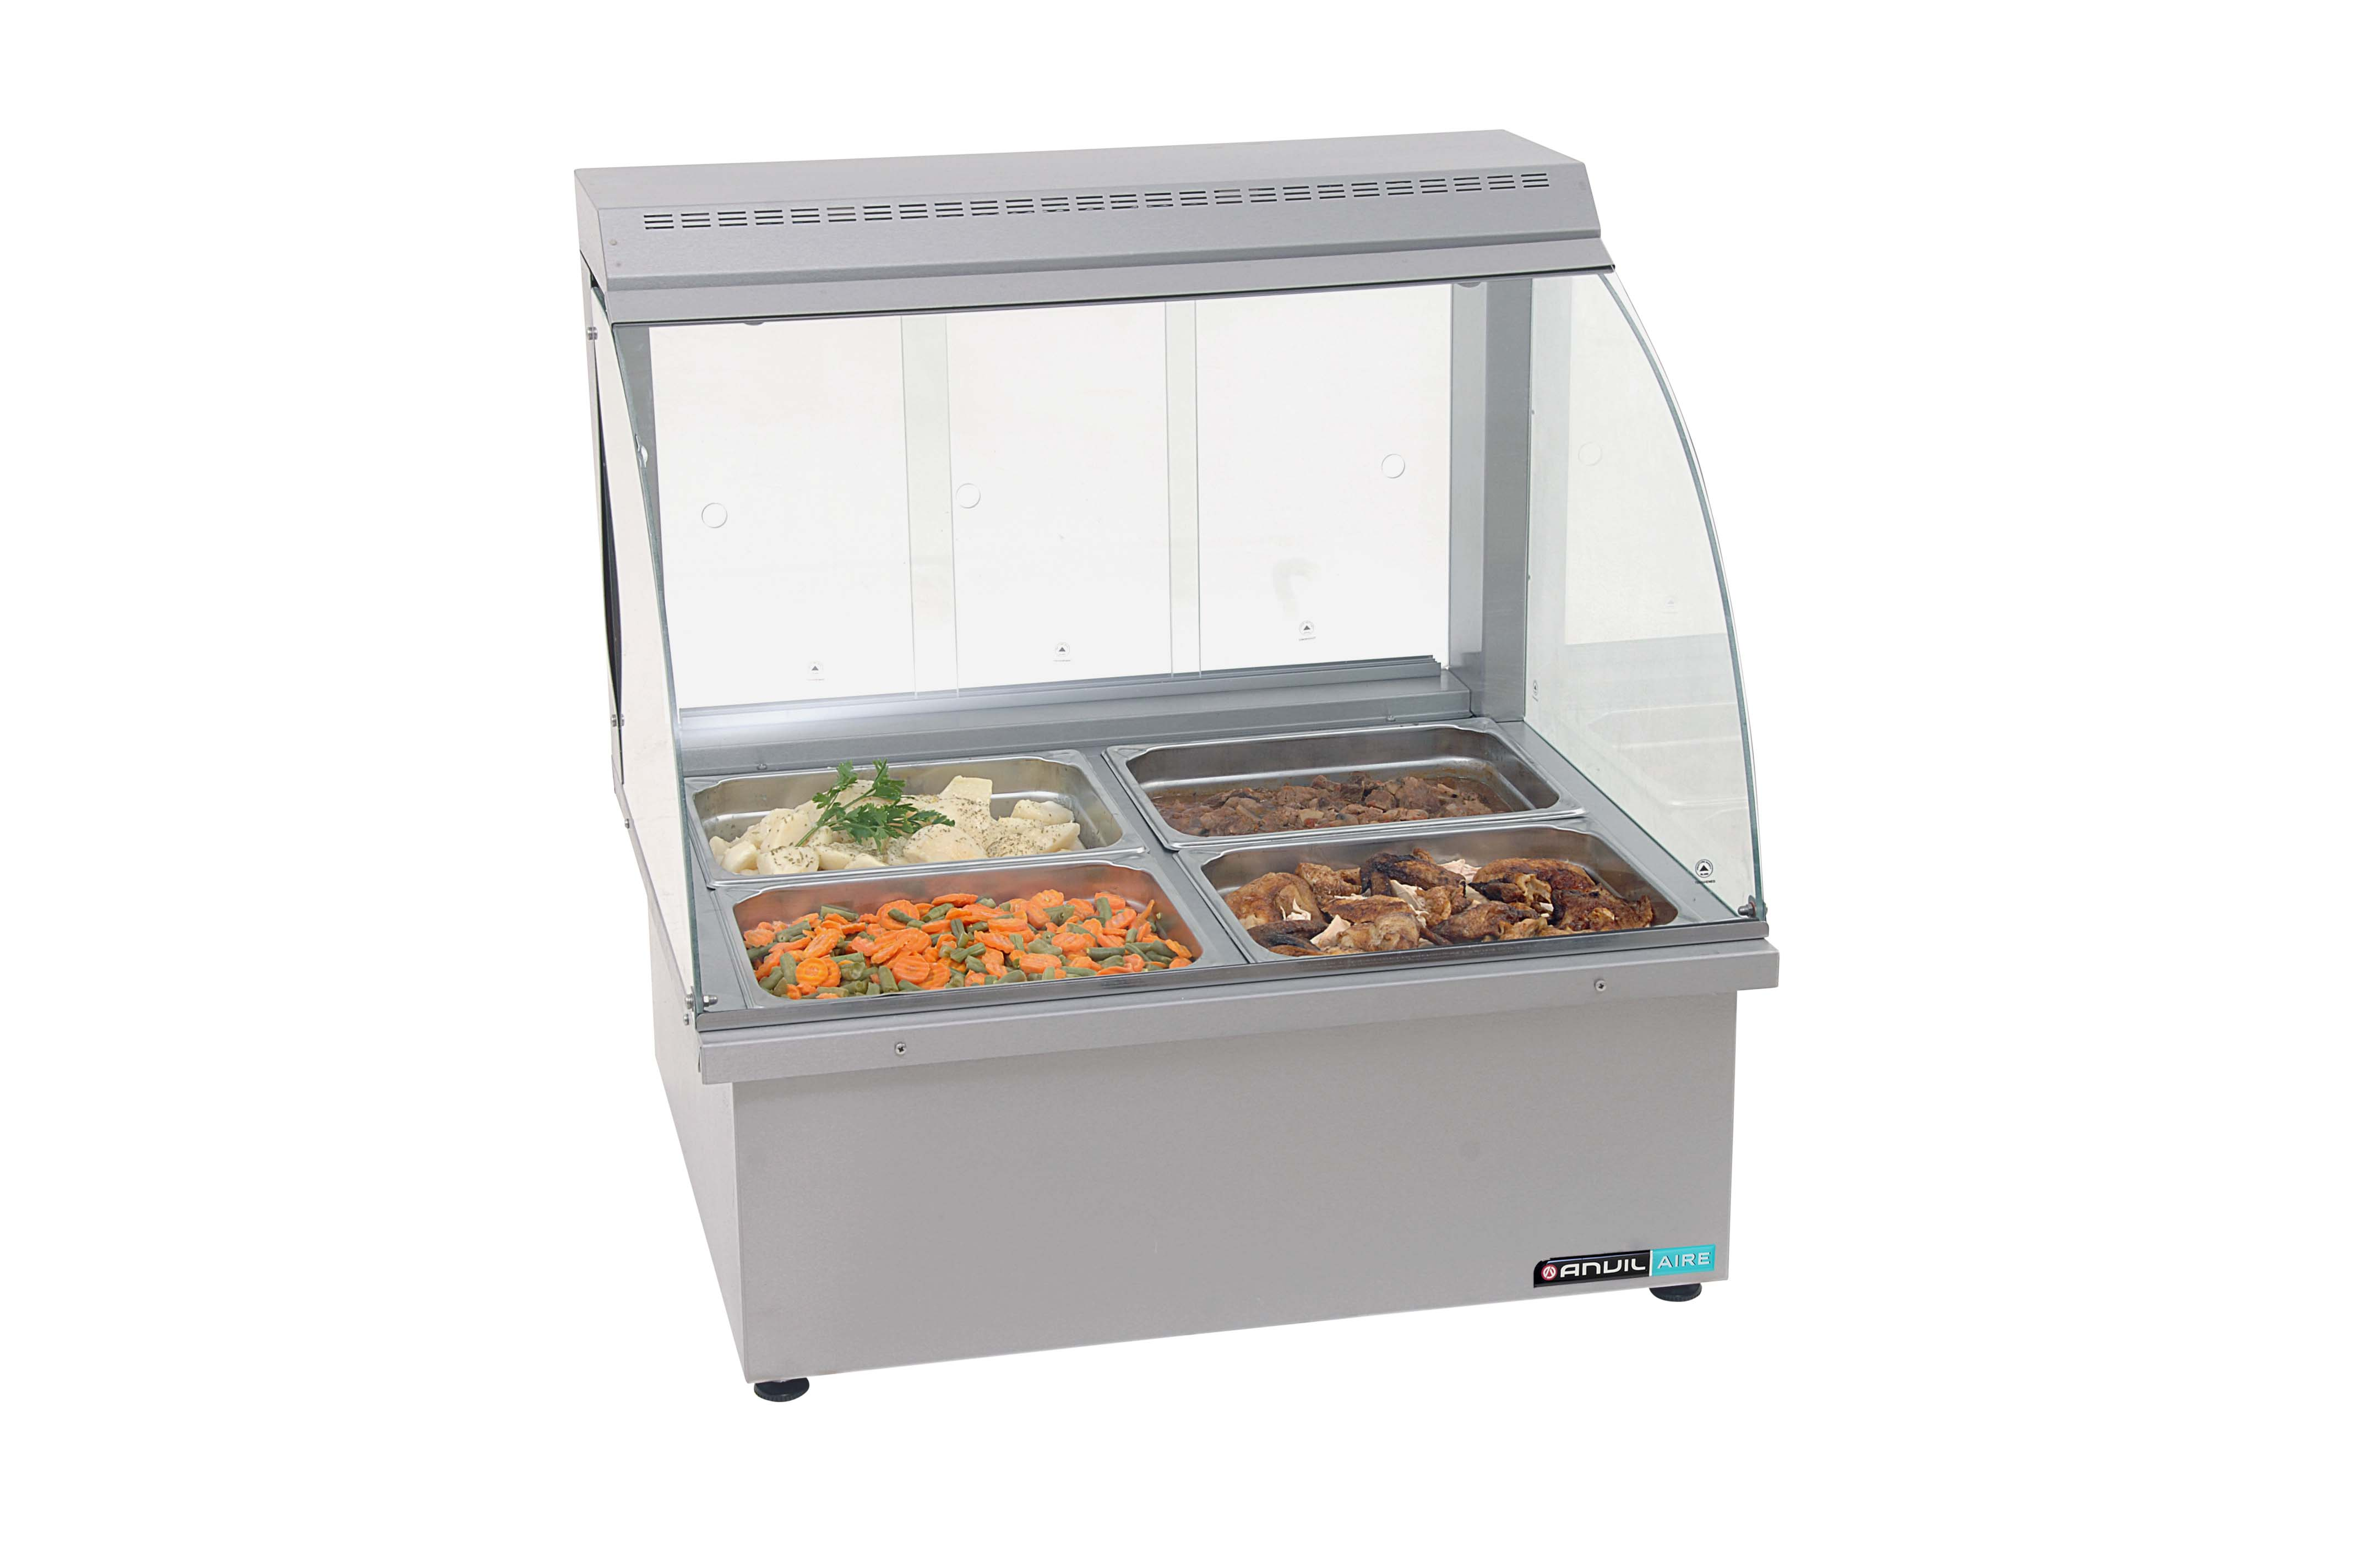 bma4002--hot-food-bar--bain-marie-anvil-table-top--2-division